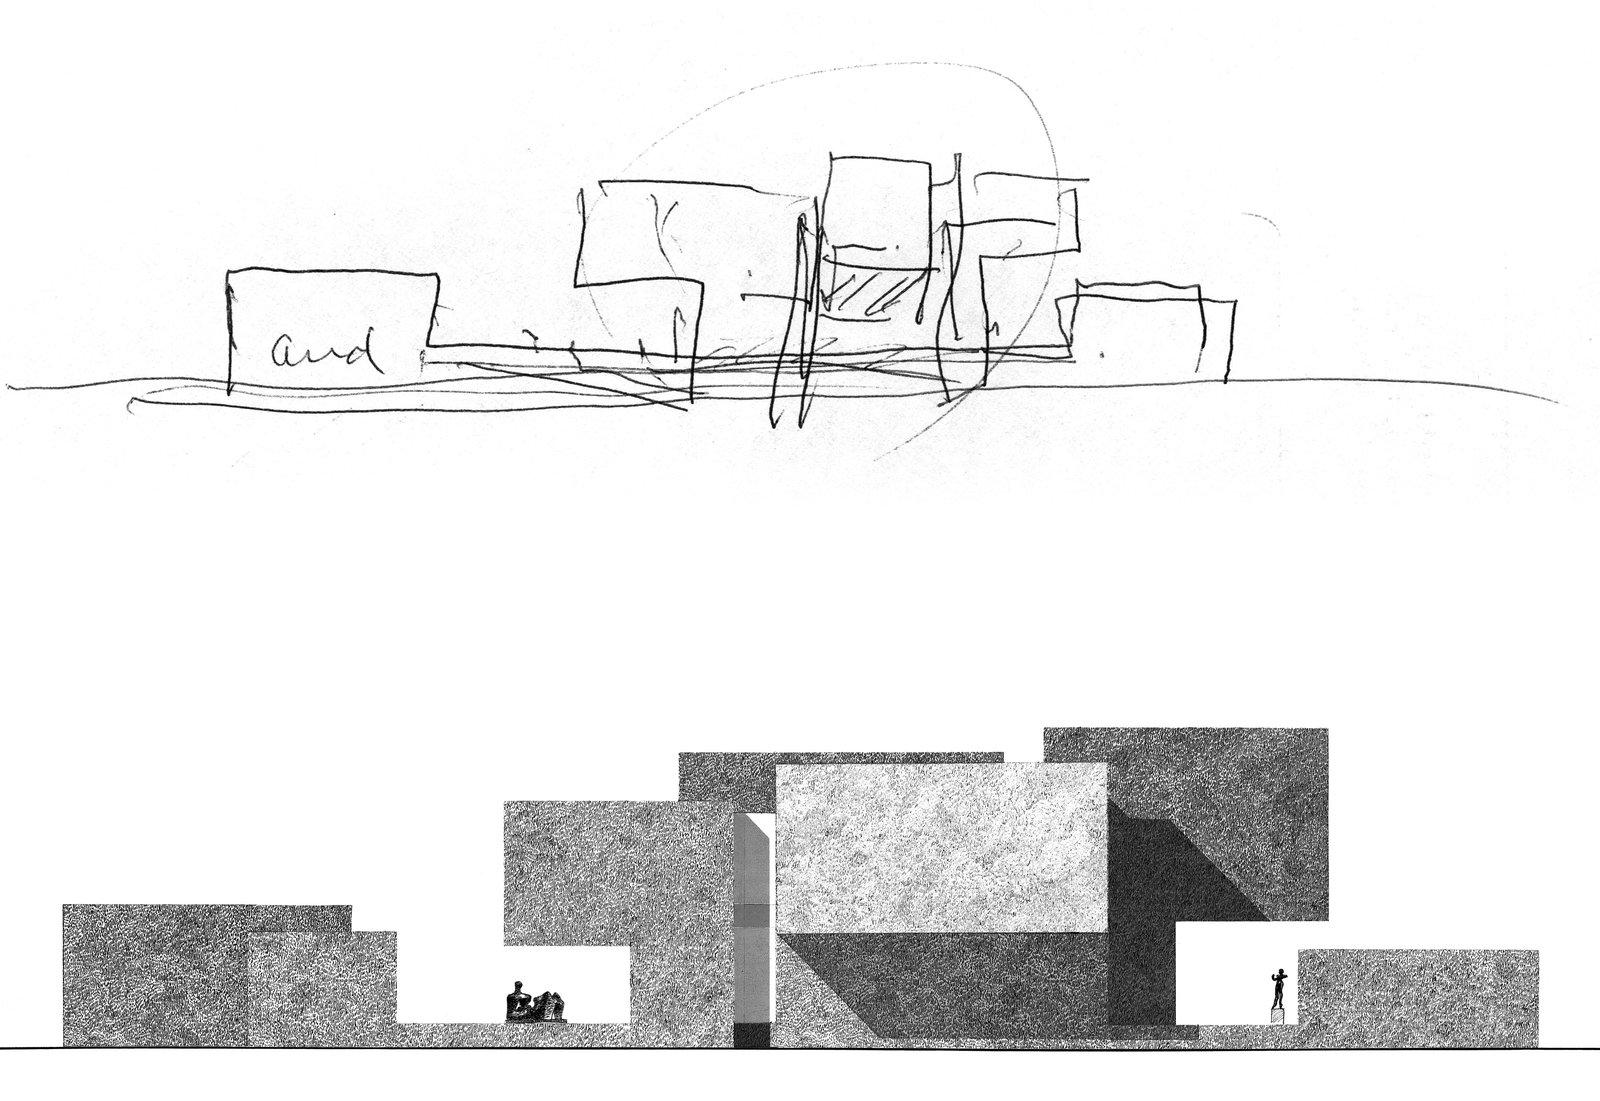 wpp8-2.ren.PCF.6147_Everson_drawing-sketch.max-1600x1600.jpg